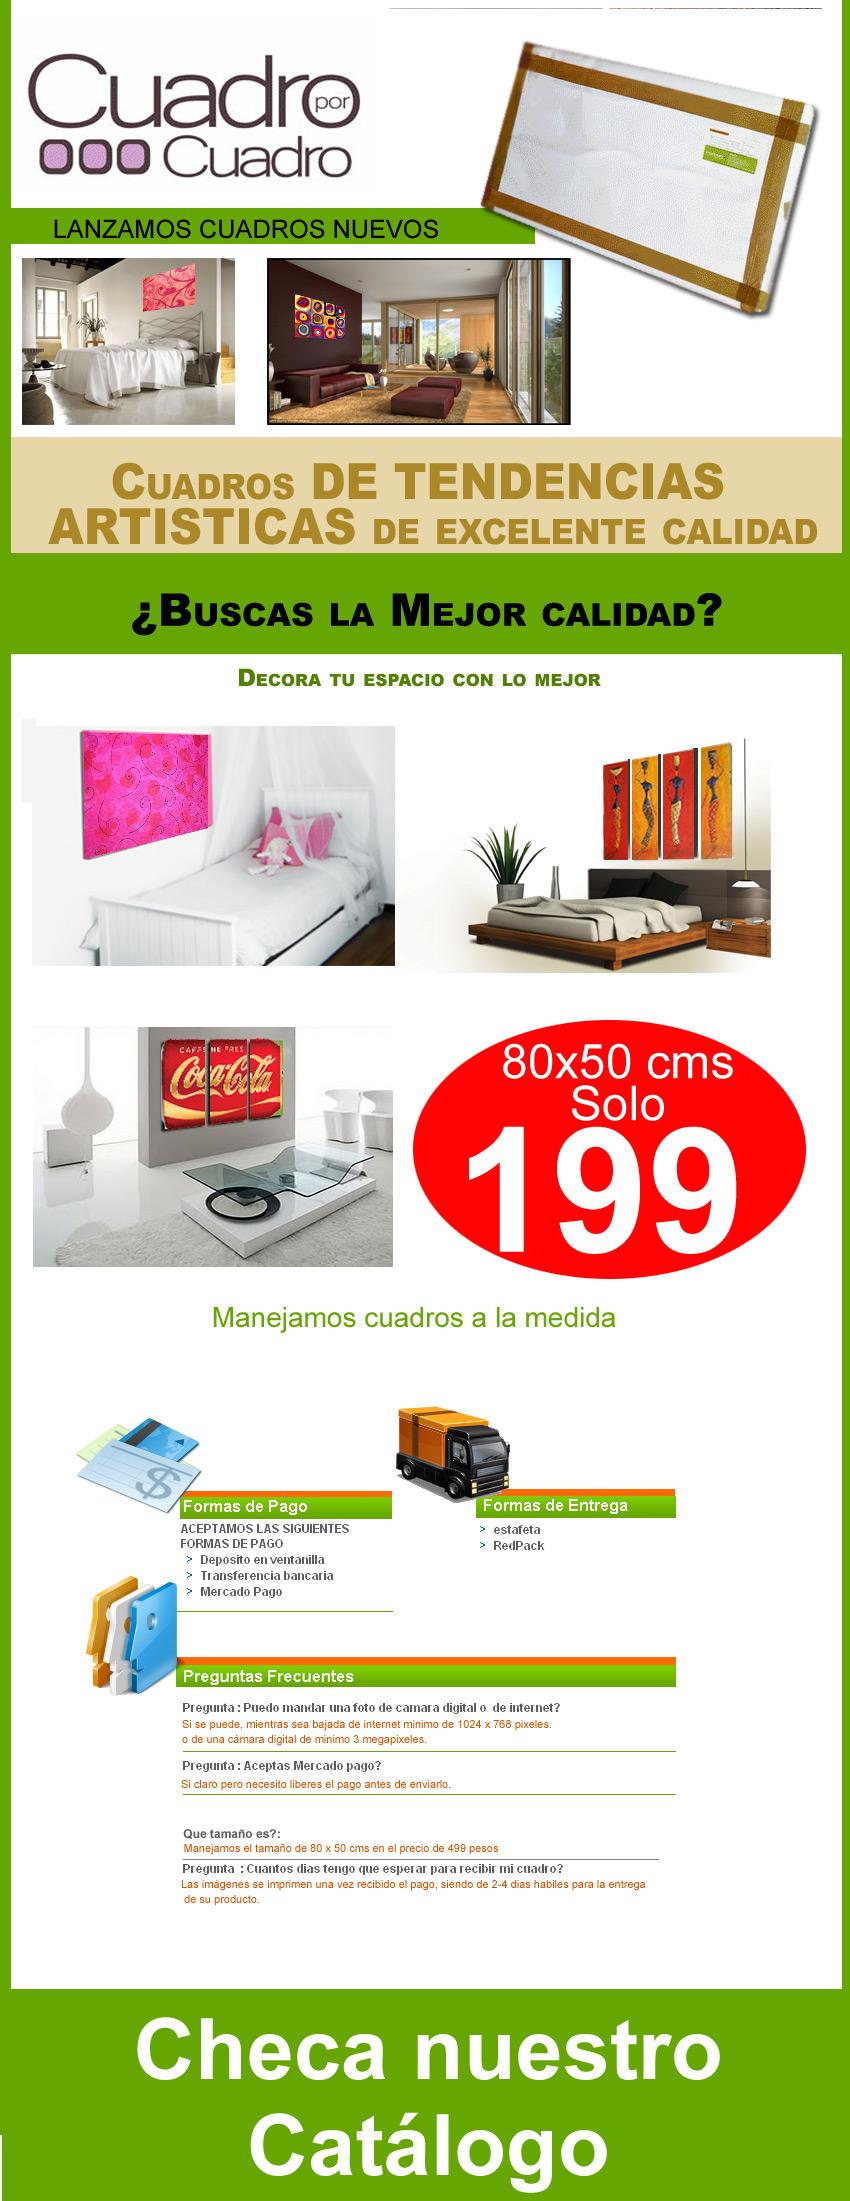 Cuadros decorativos clasicos vinil lona 199 pesos for Cuadros decorativos clasicos